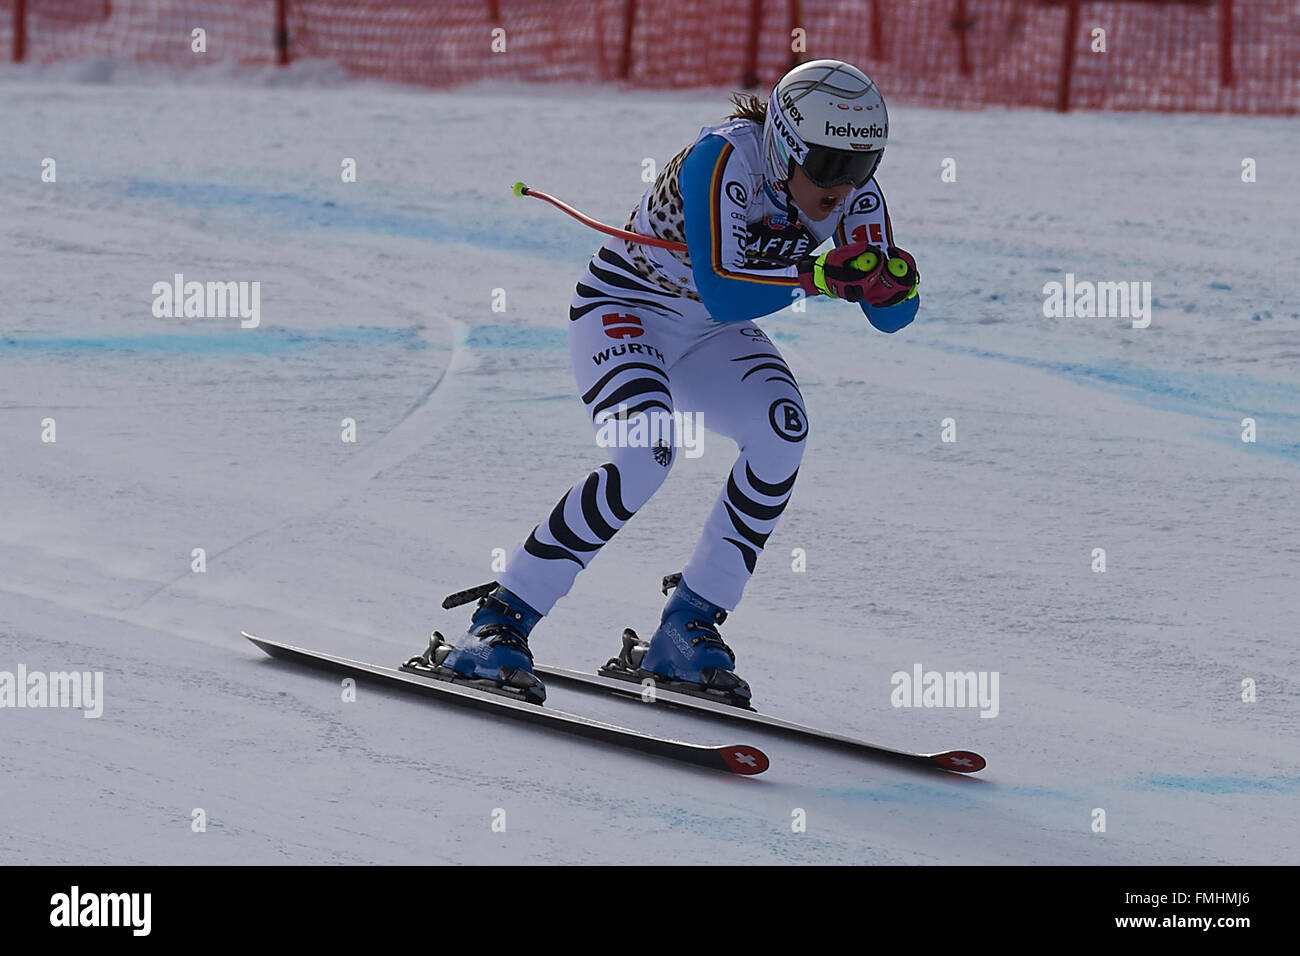 Lenzerheide, Switzerland. 12th March, 2016. Viktoria Rebensburg (GER) during her run in the Ladies' Super G at the Stock Photo